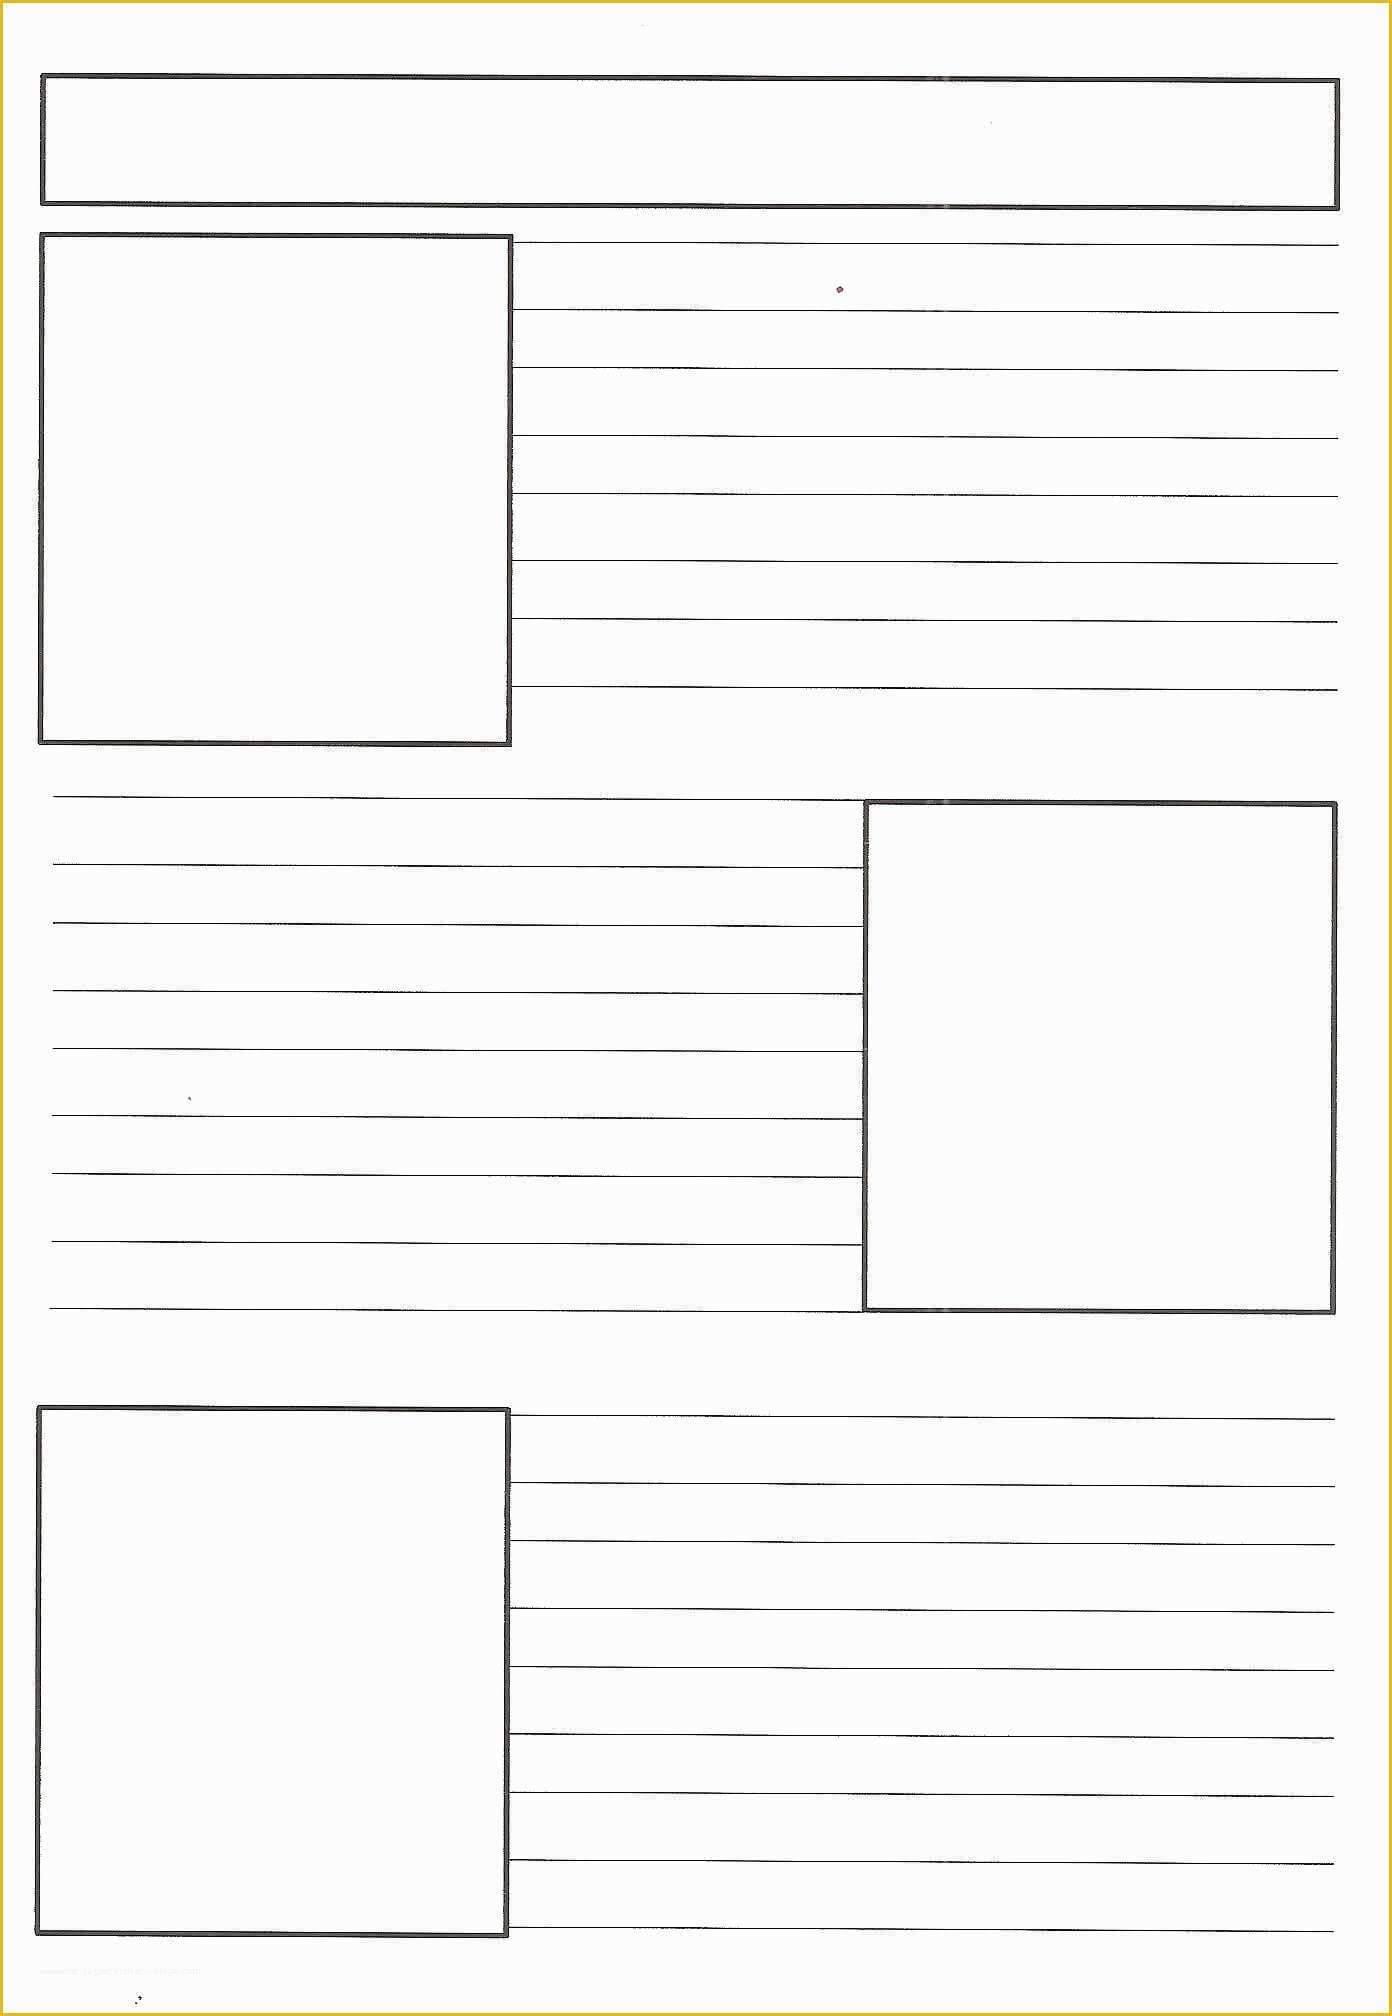 041 Template Ideas Free Printable Newspaper Templates For Within Blank Newspaper Template For Word